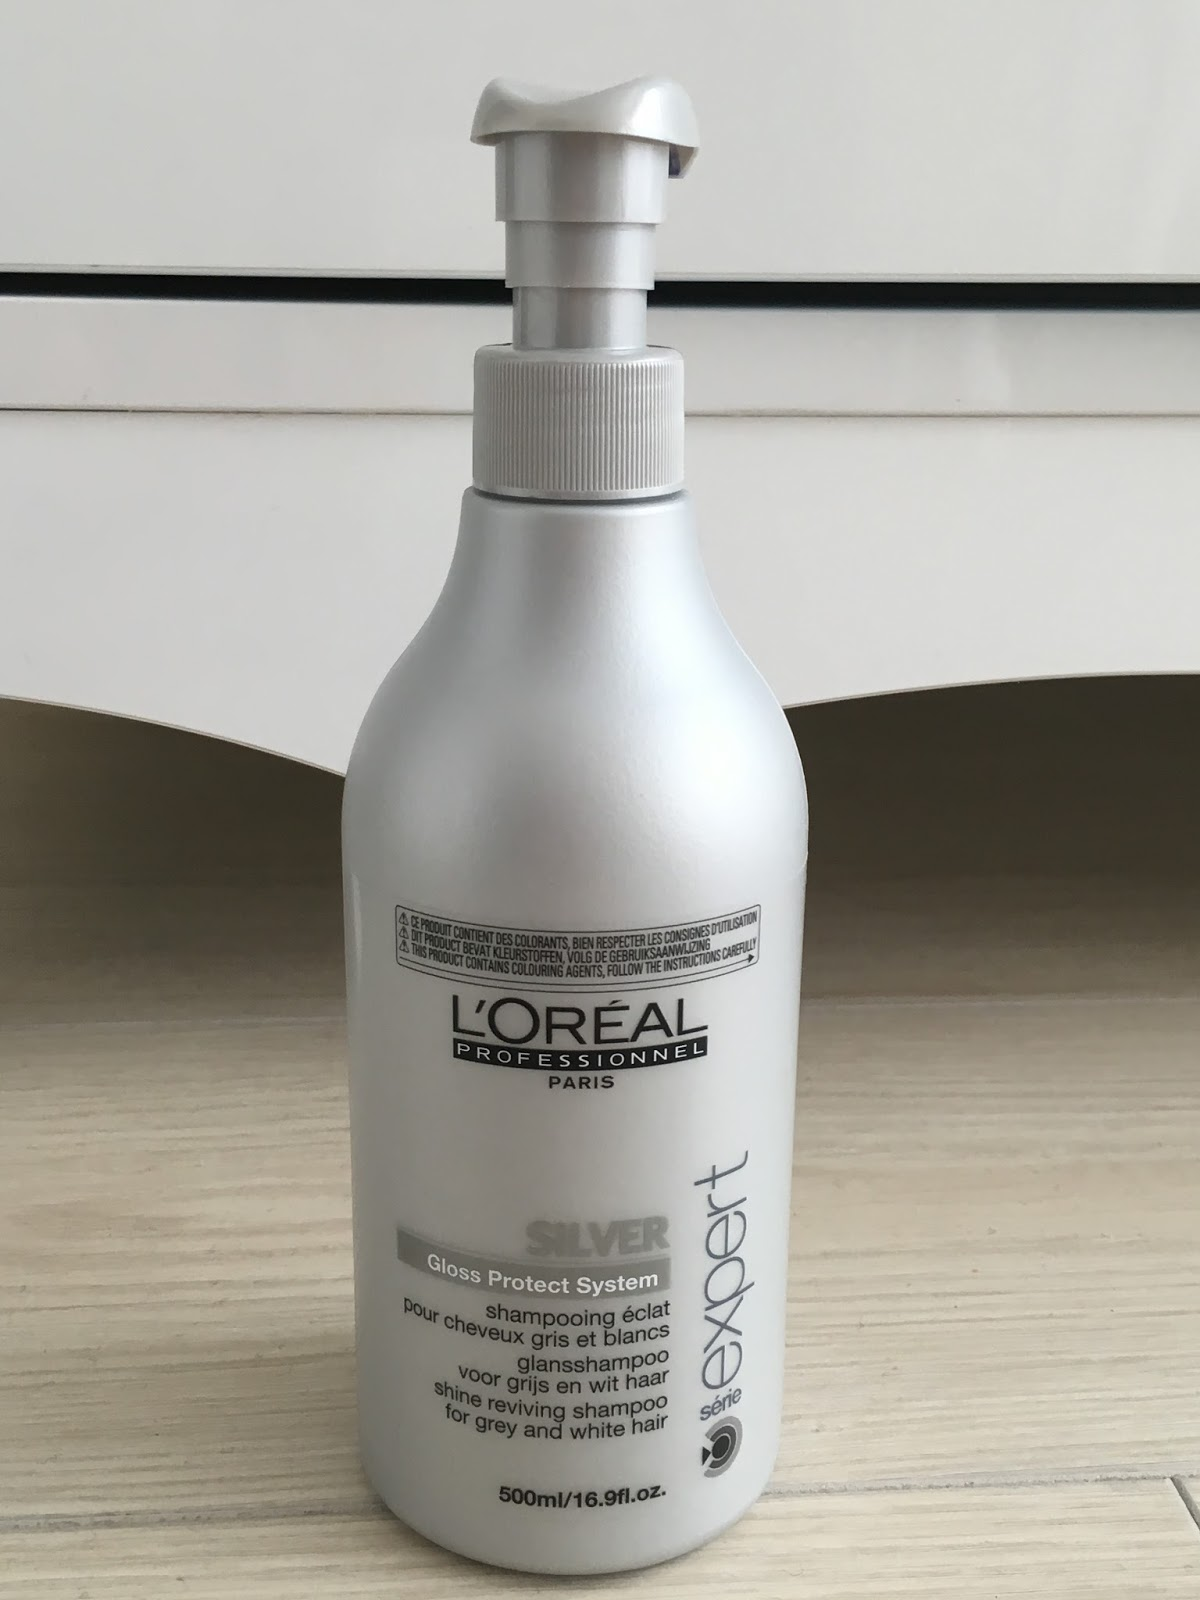 Loreal silver şampuan